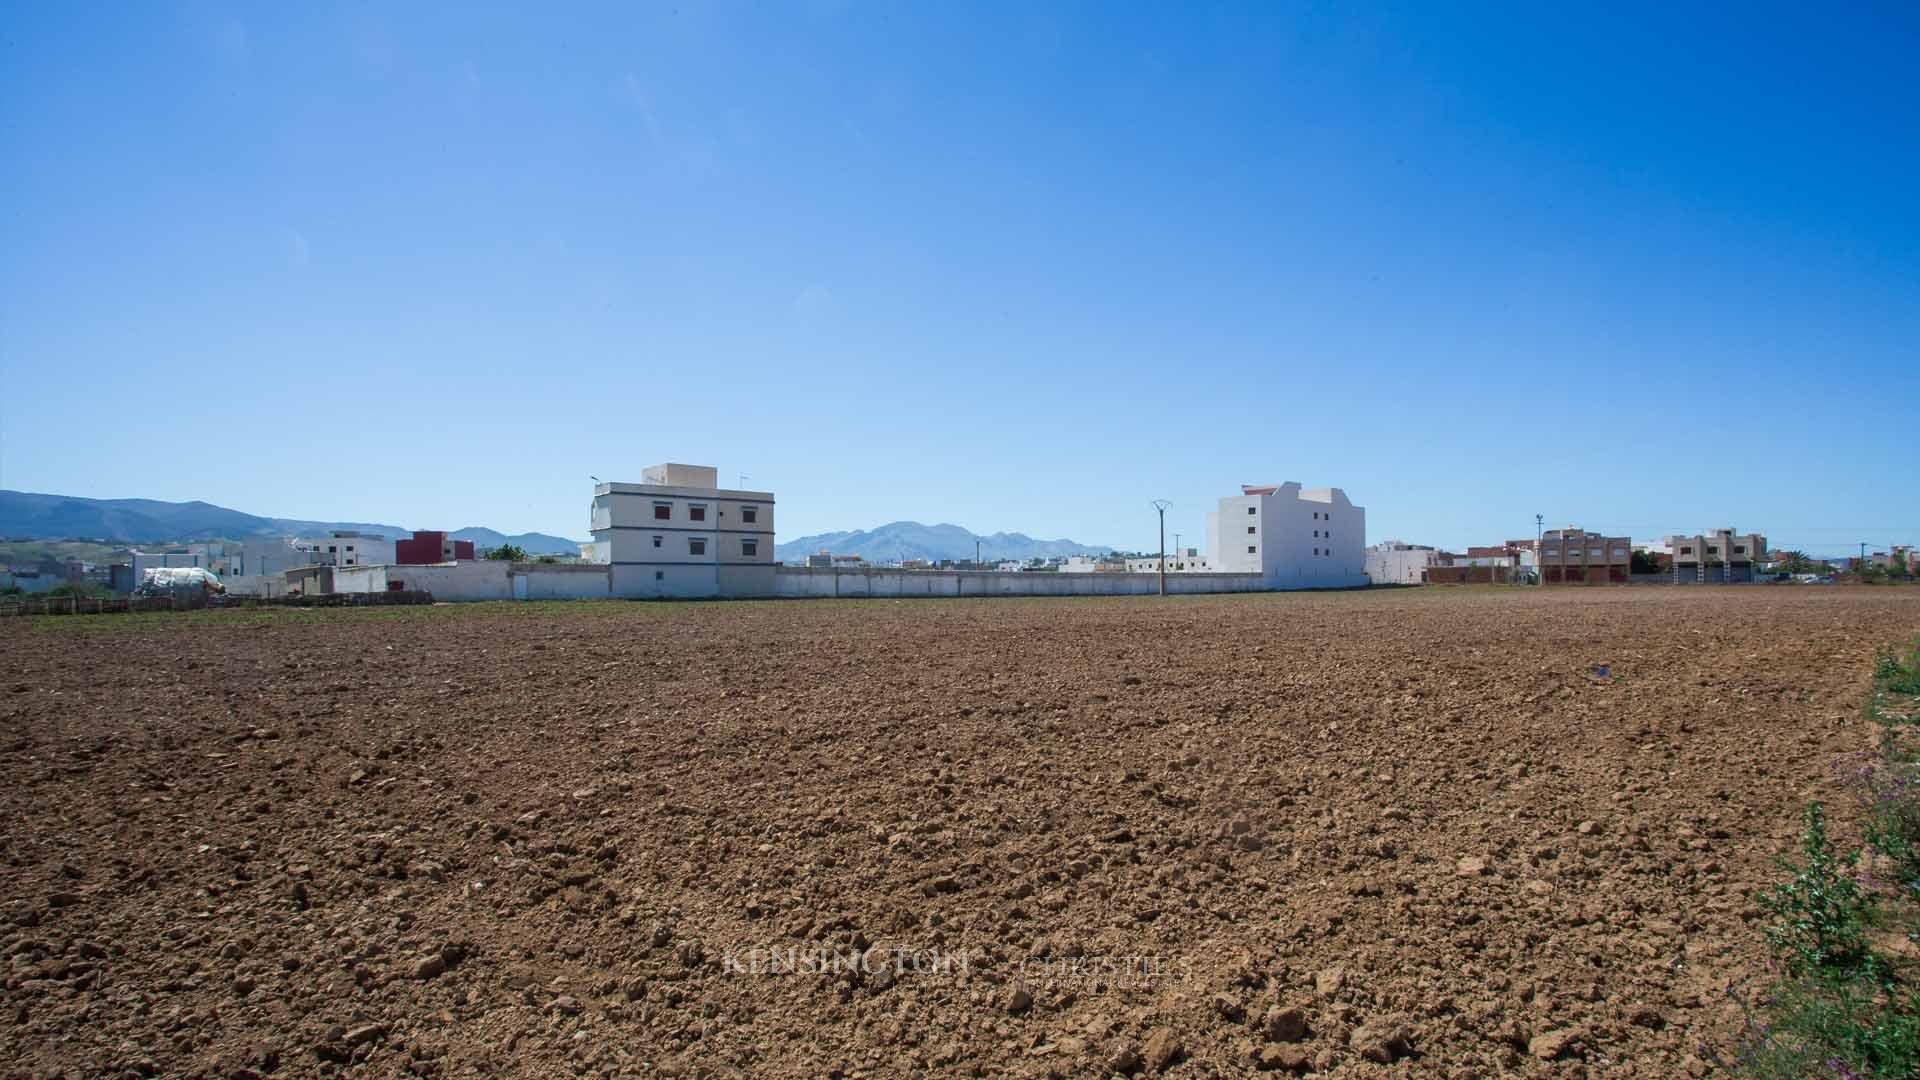 KPPM01238: Terrain Tetouan 2 Terrain constructible Tétouan Maroc